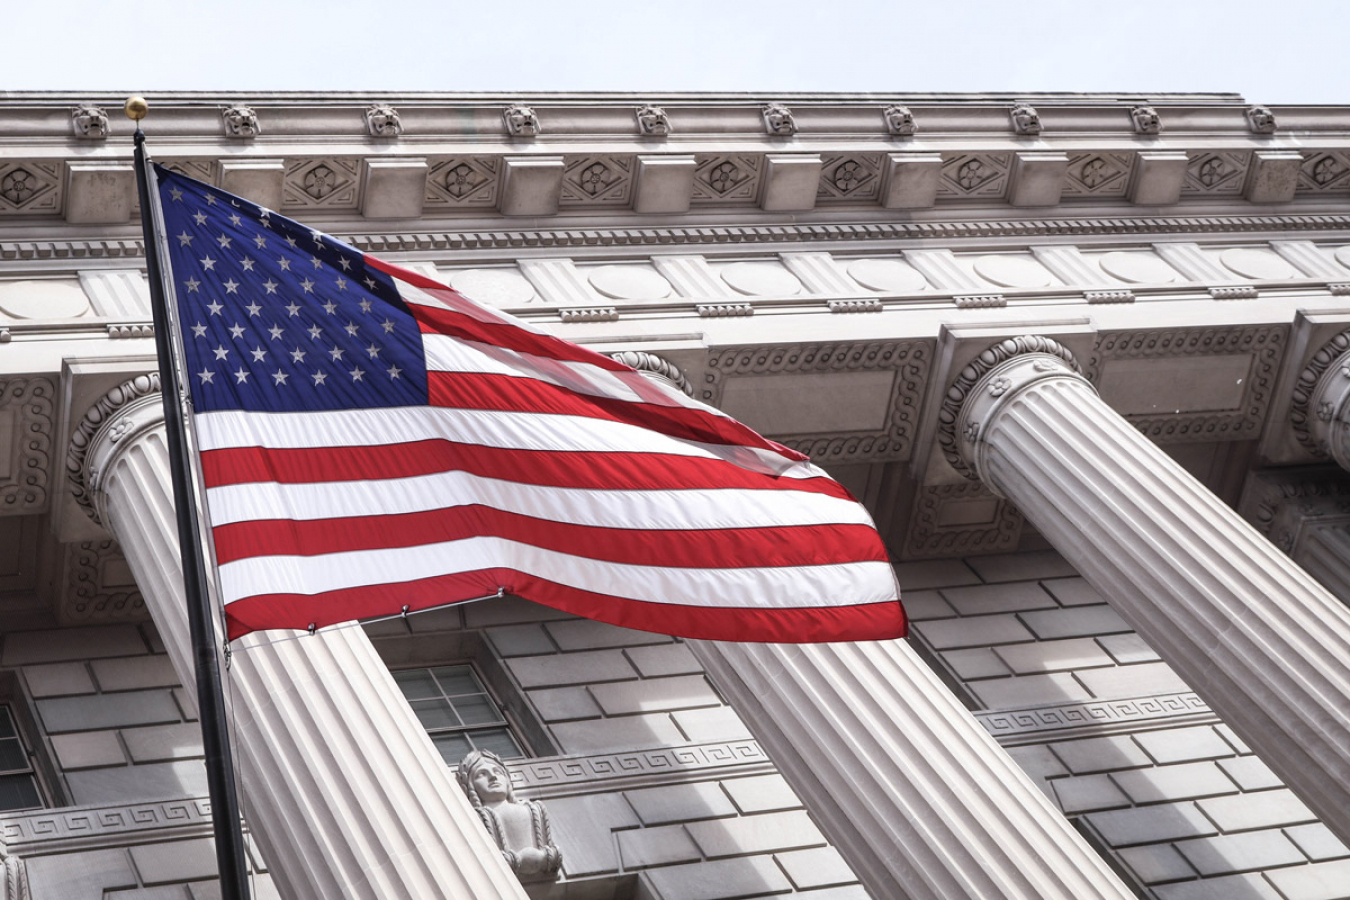 U.S. Department of Commerce, Washington